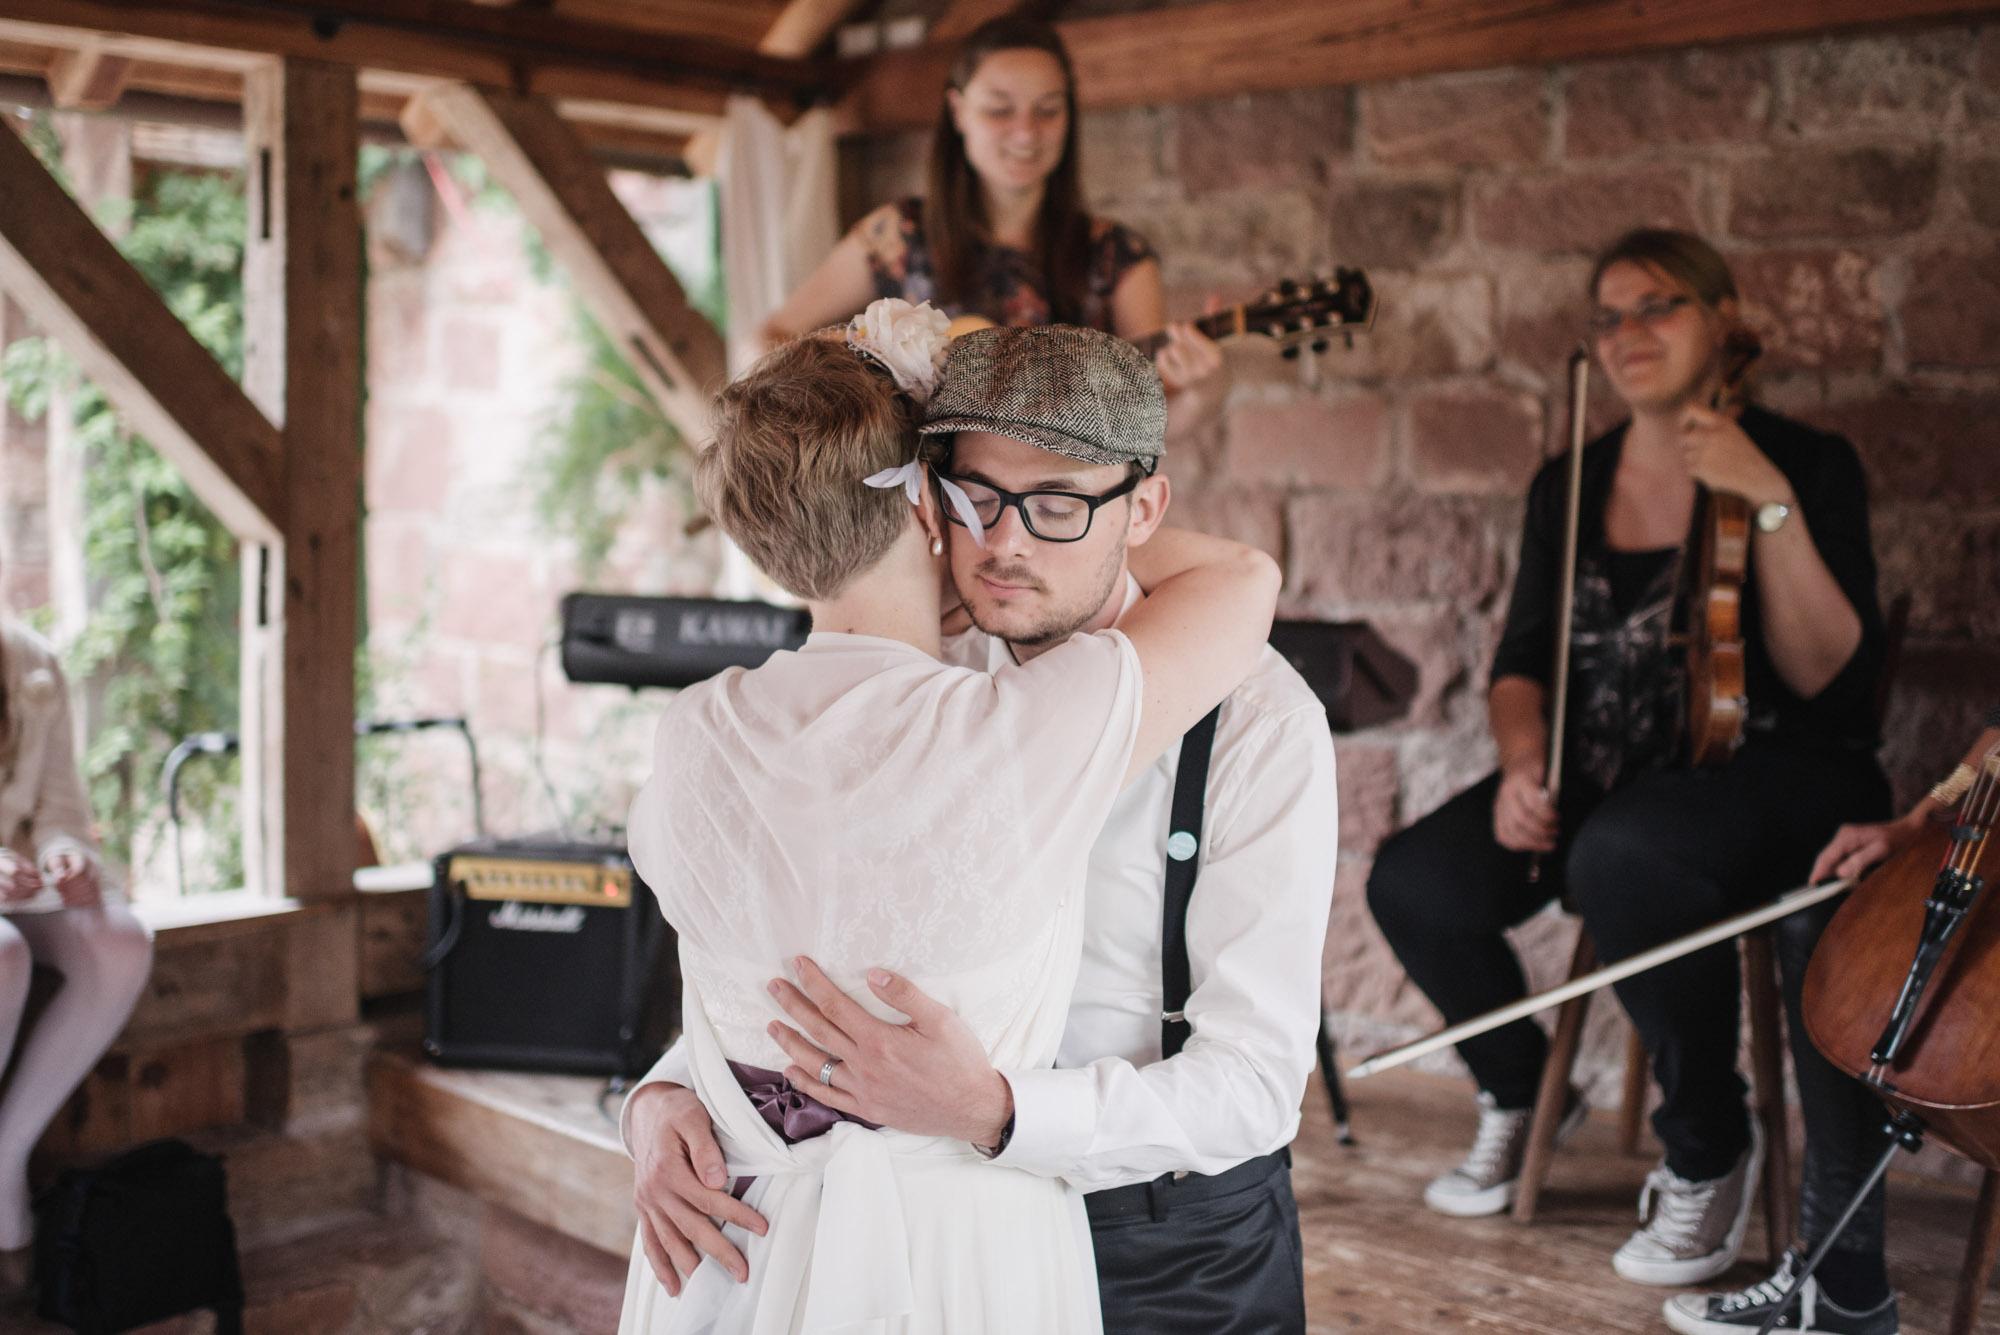 Hochzeitsfotograf • Vitali Skidan  Hochzeitsfotos